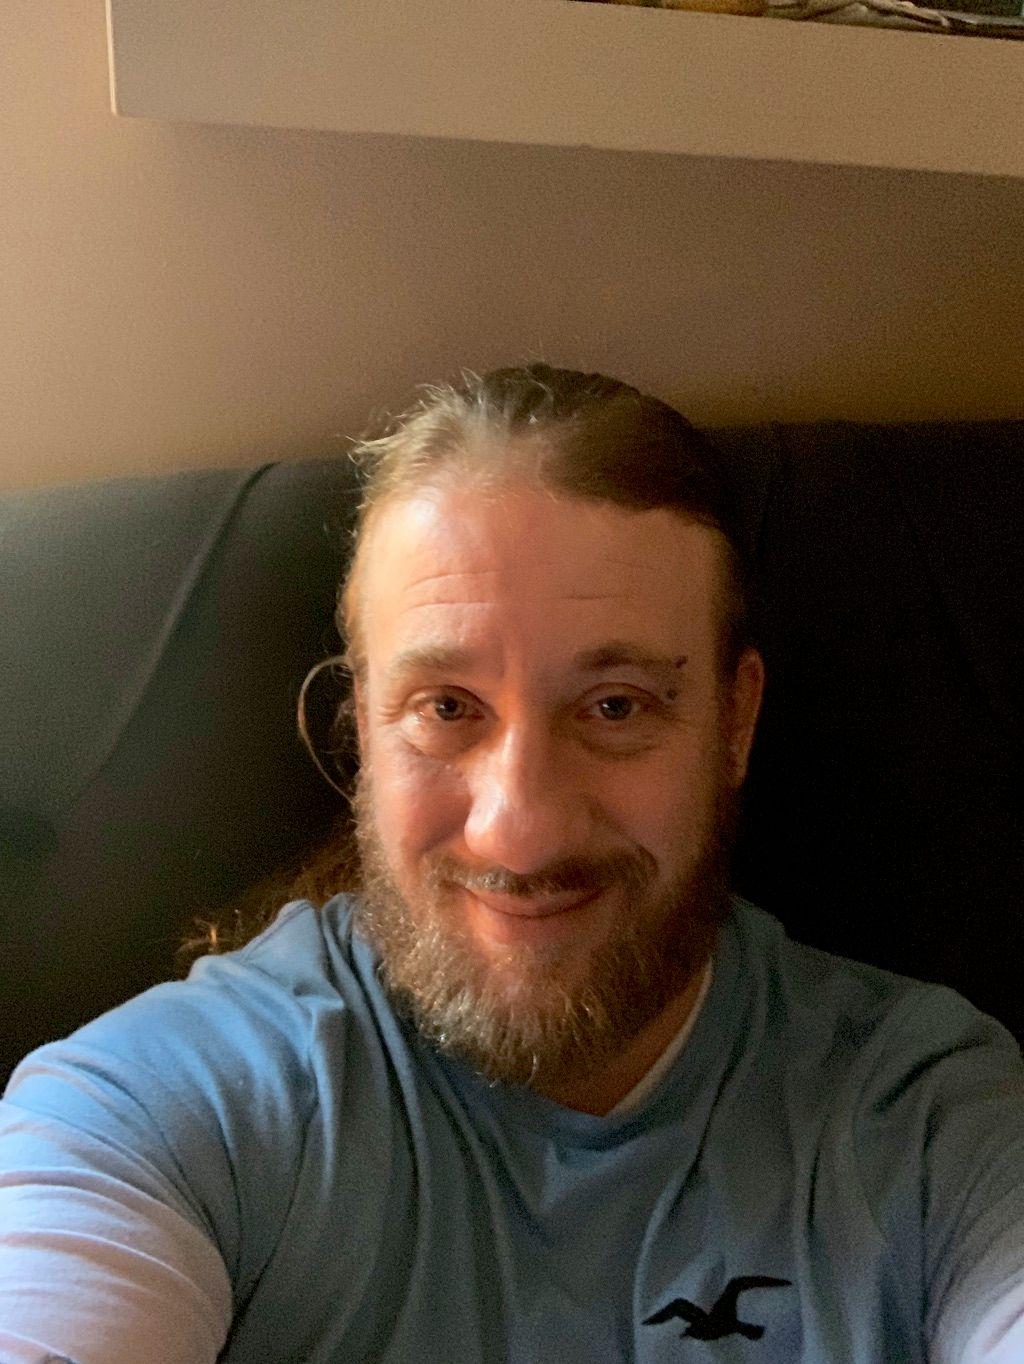 Jason bucchi (owner/installer)